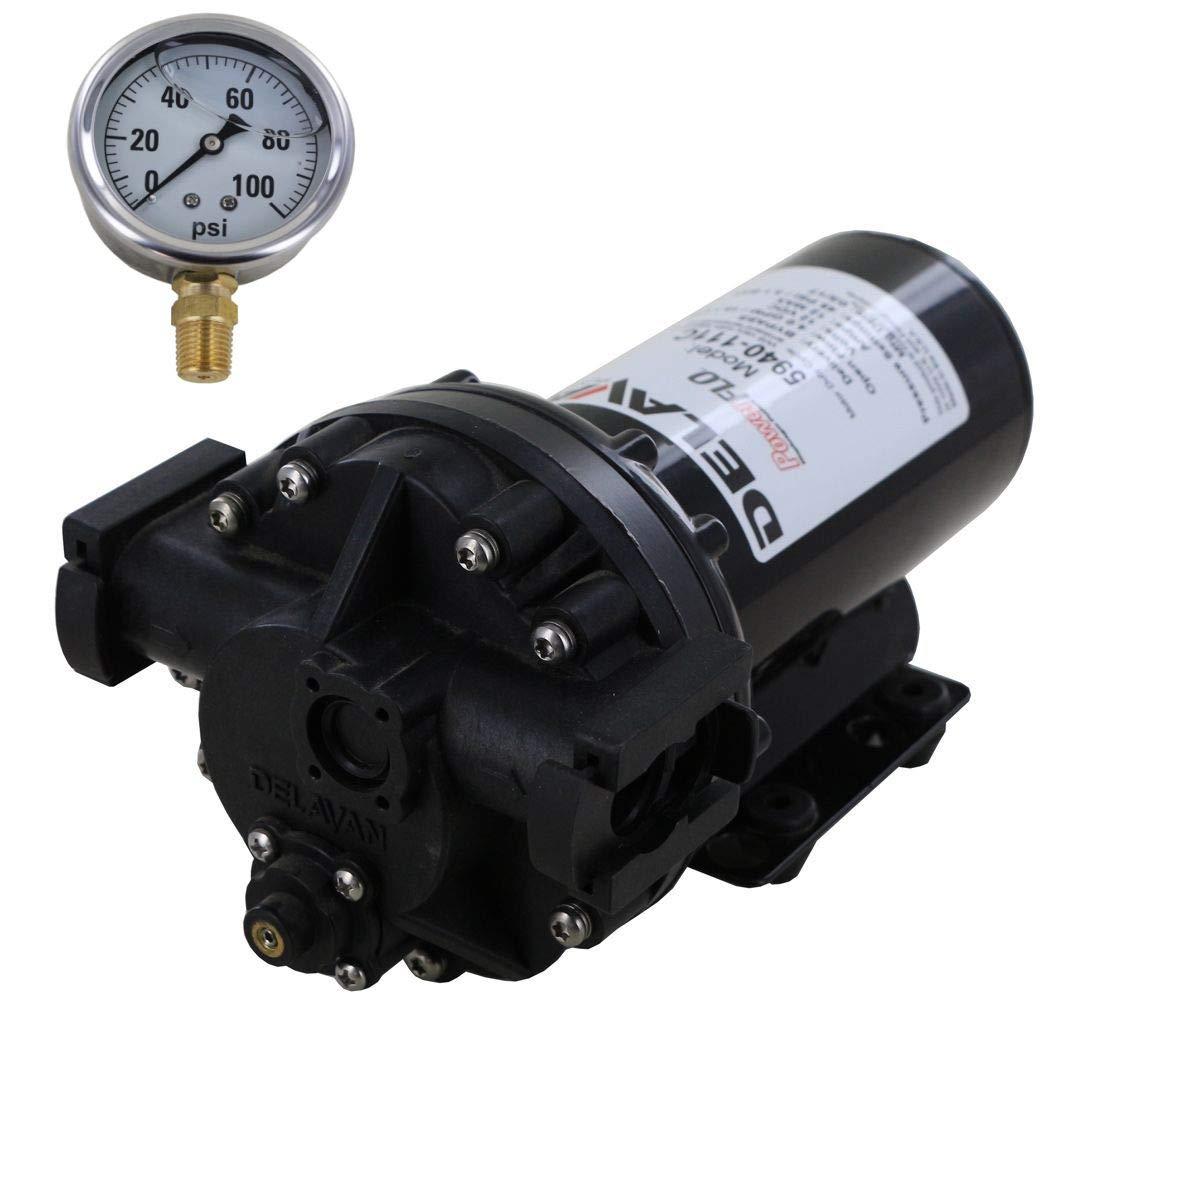 Delavan 5940-111C PowerFlo 12V Bypass Diaphragm Pump with 100 PSI Pressure Gauge (Bundle, 2 Items)